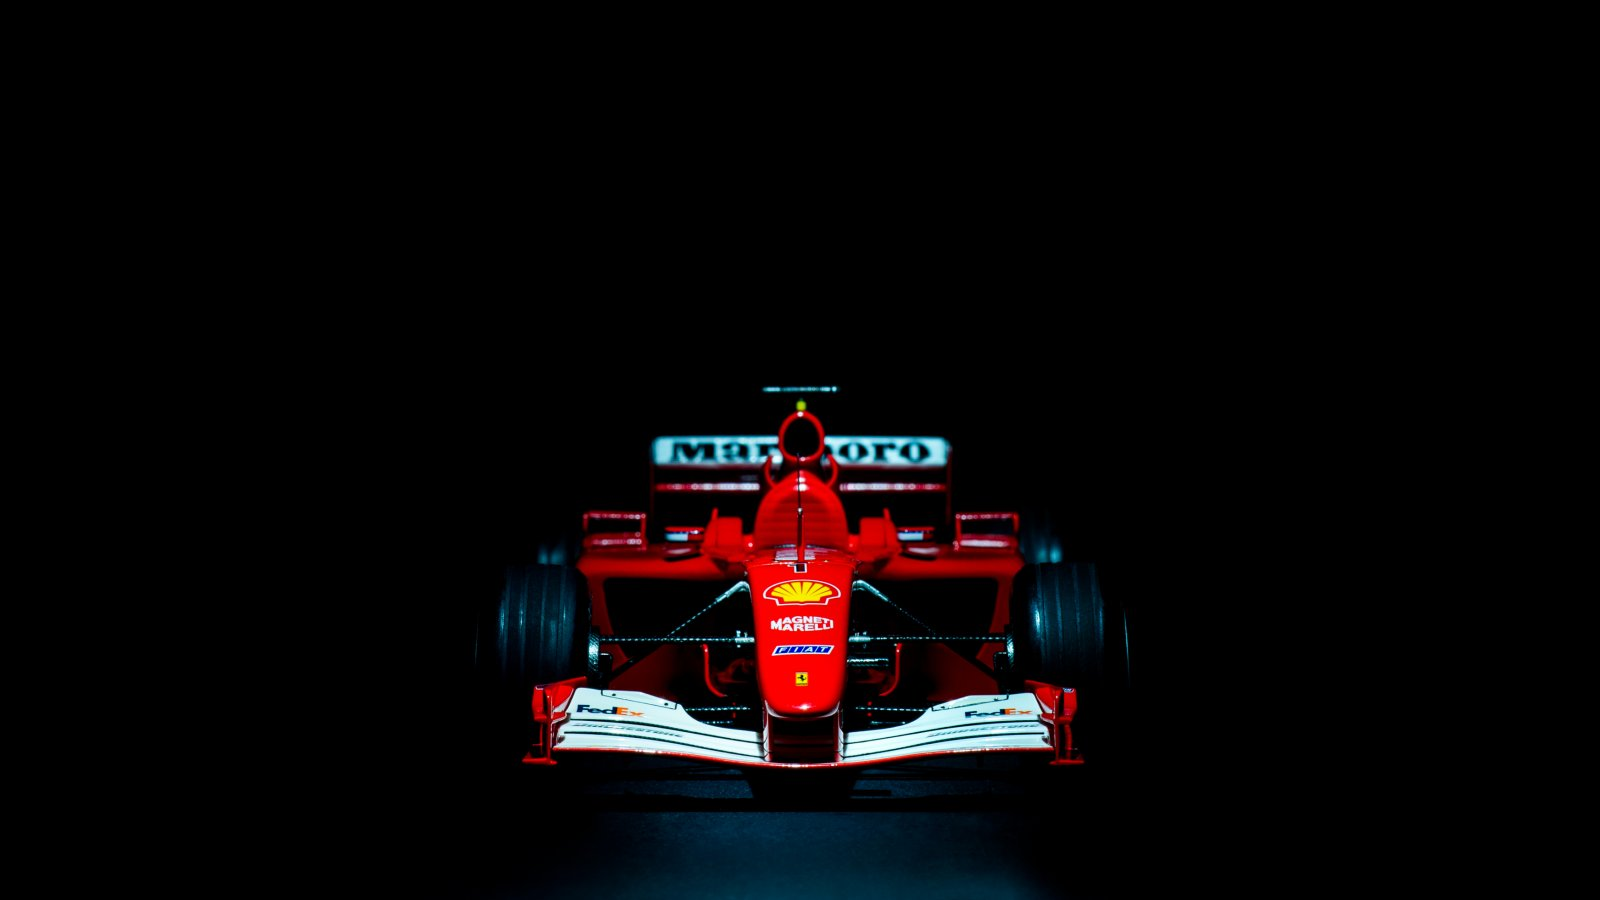 Ferrari F2001 | Japanese GP 2001 | M. Schumacher | Tamiya 1/20